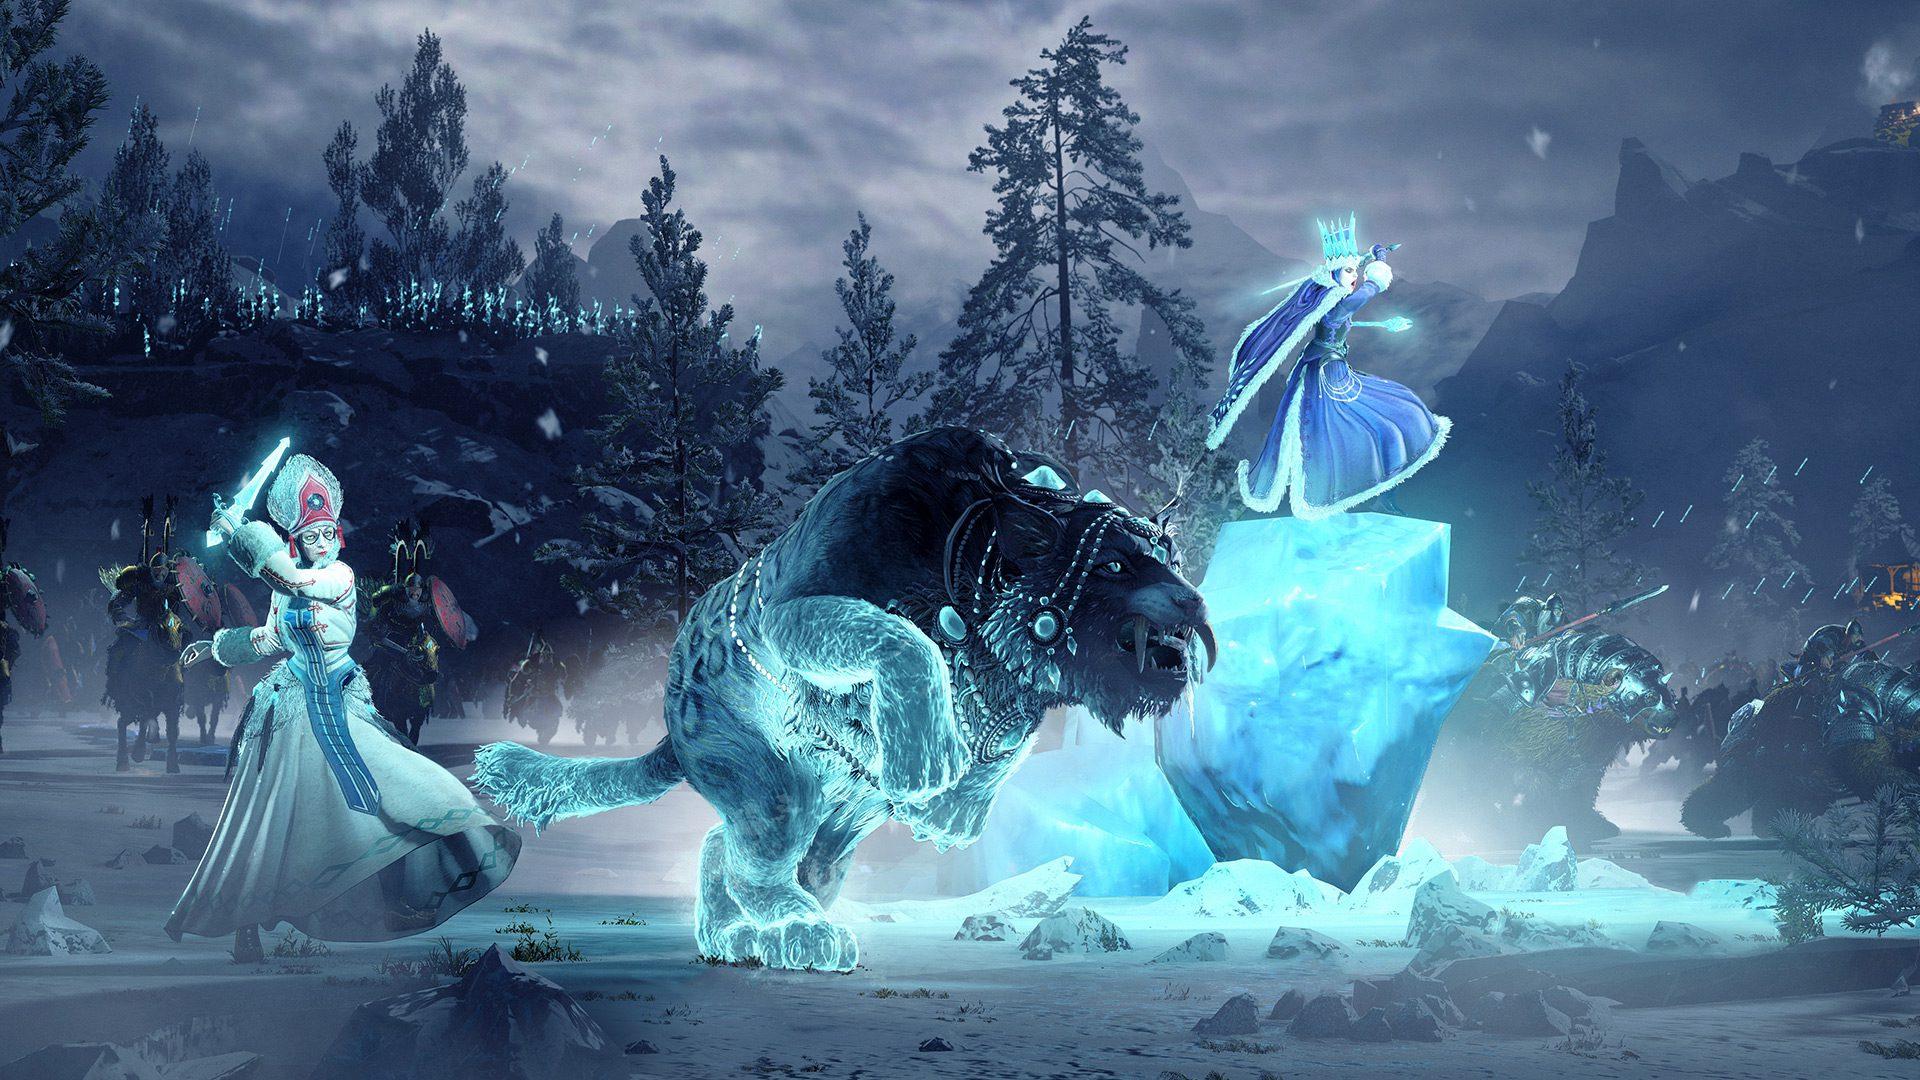 An icy battle in Total War: Warhammer III